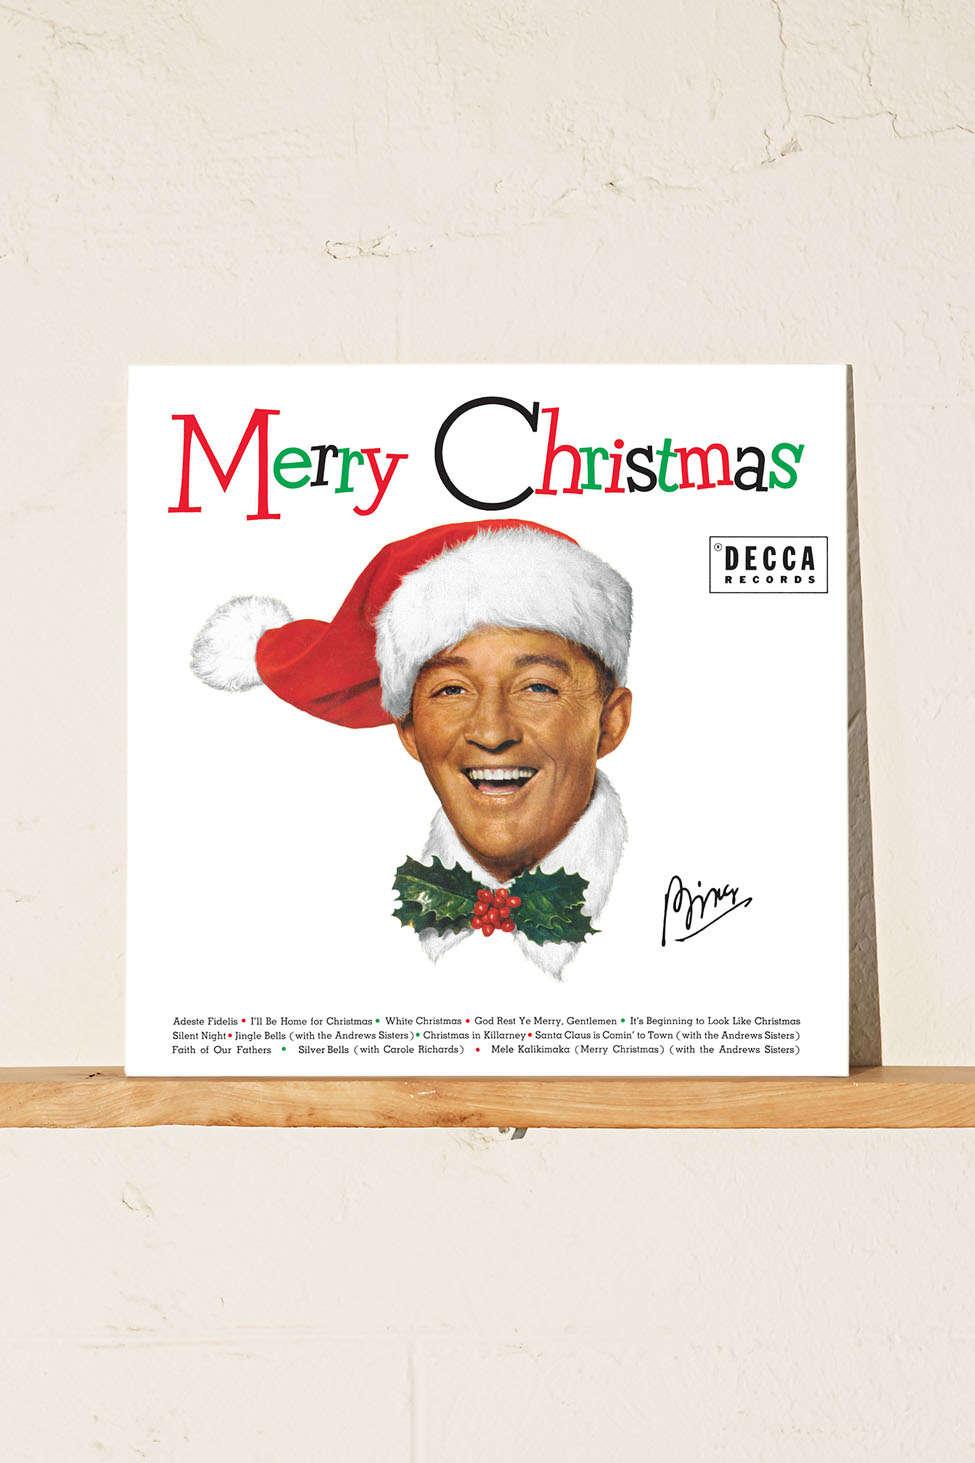 Bing Crosby Merry Christmas Lp